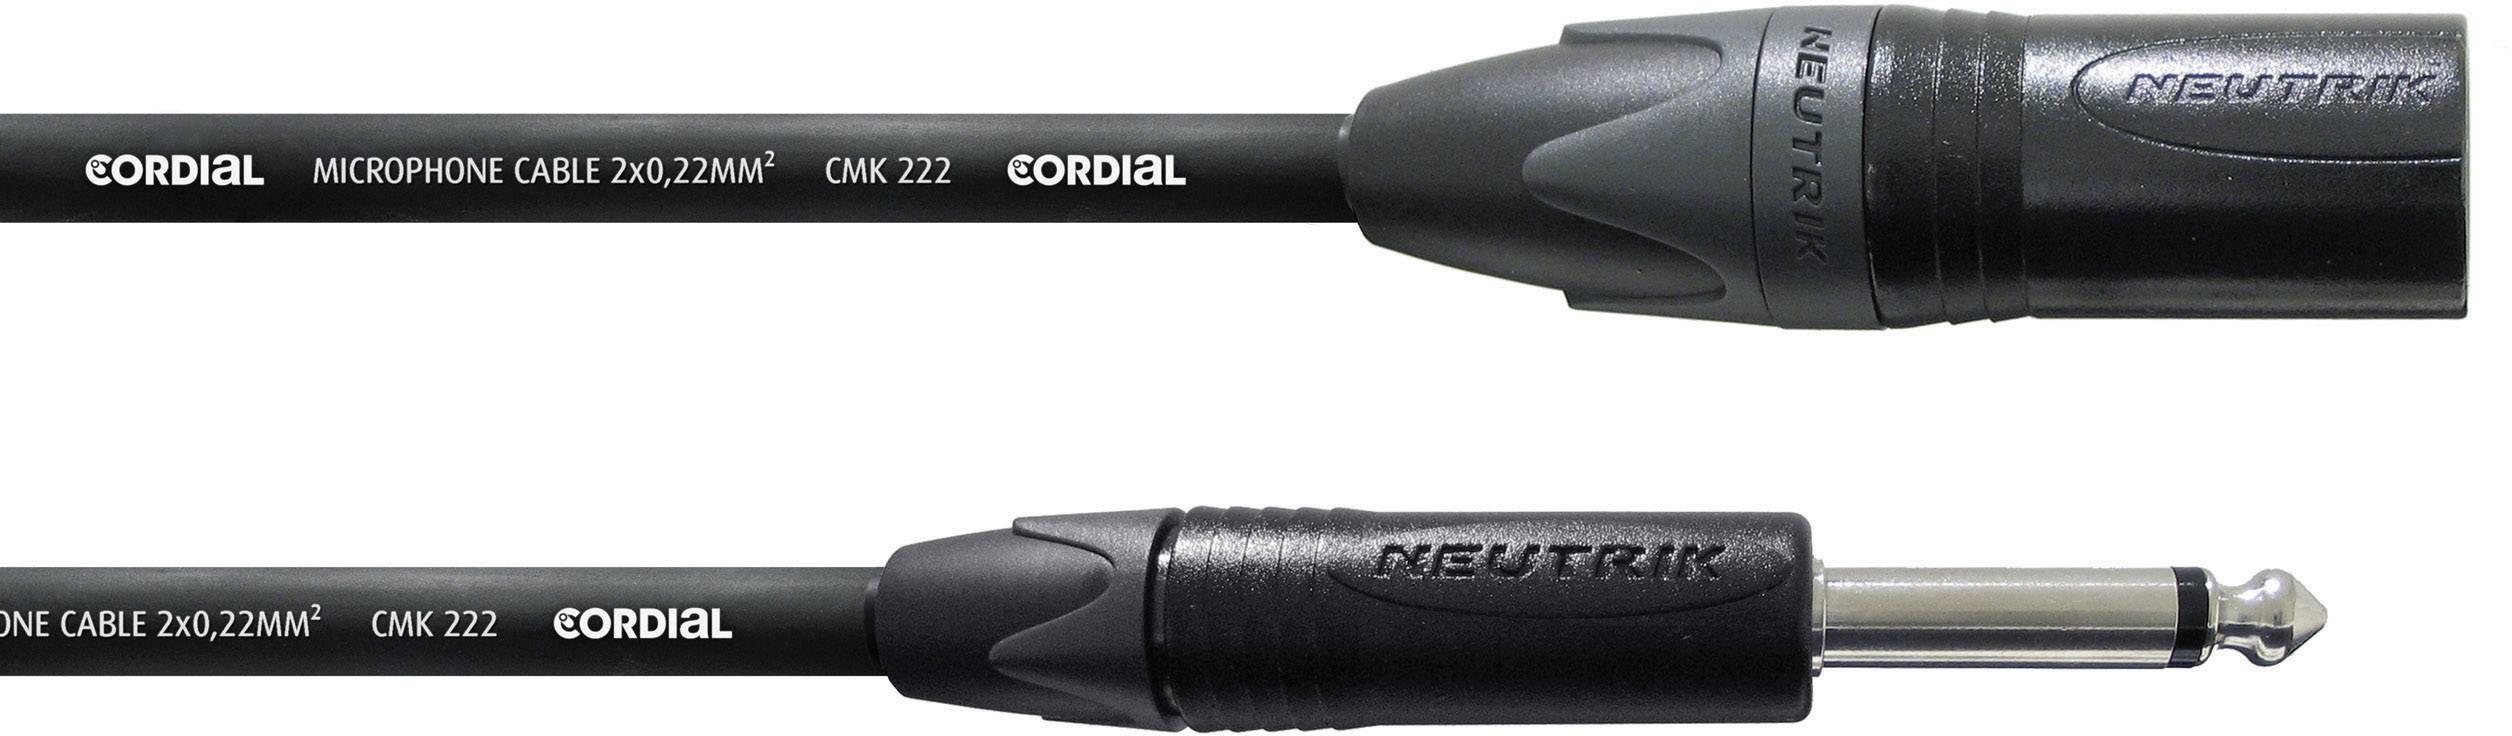 Mikrofónny XLR káblový adaptér Cordial CPM 5 MP CPM 5 MP, 5 m, čierna